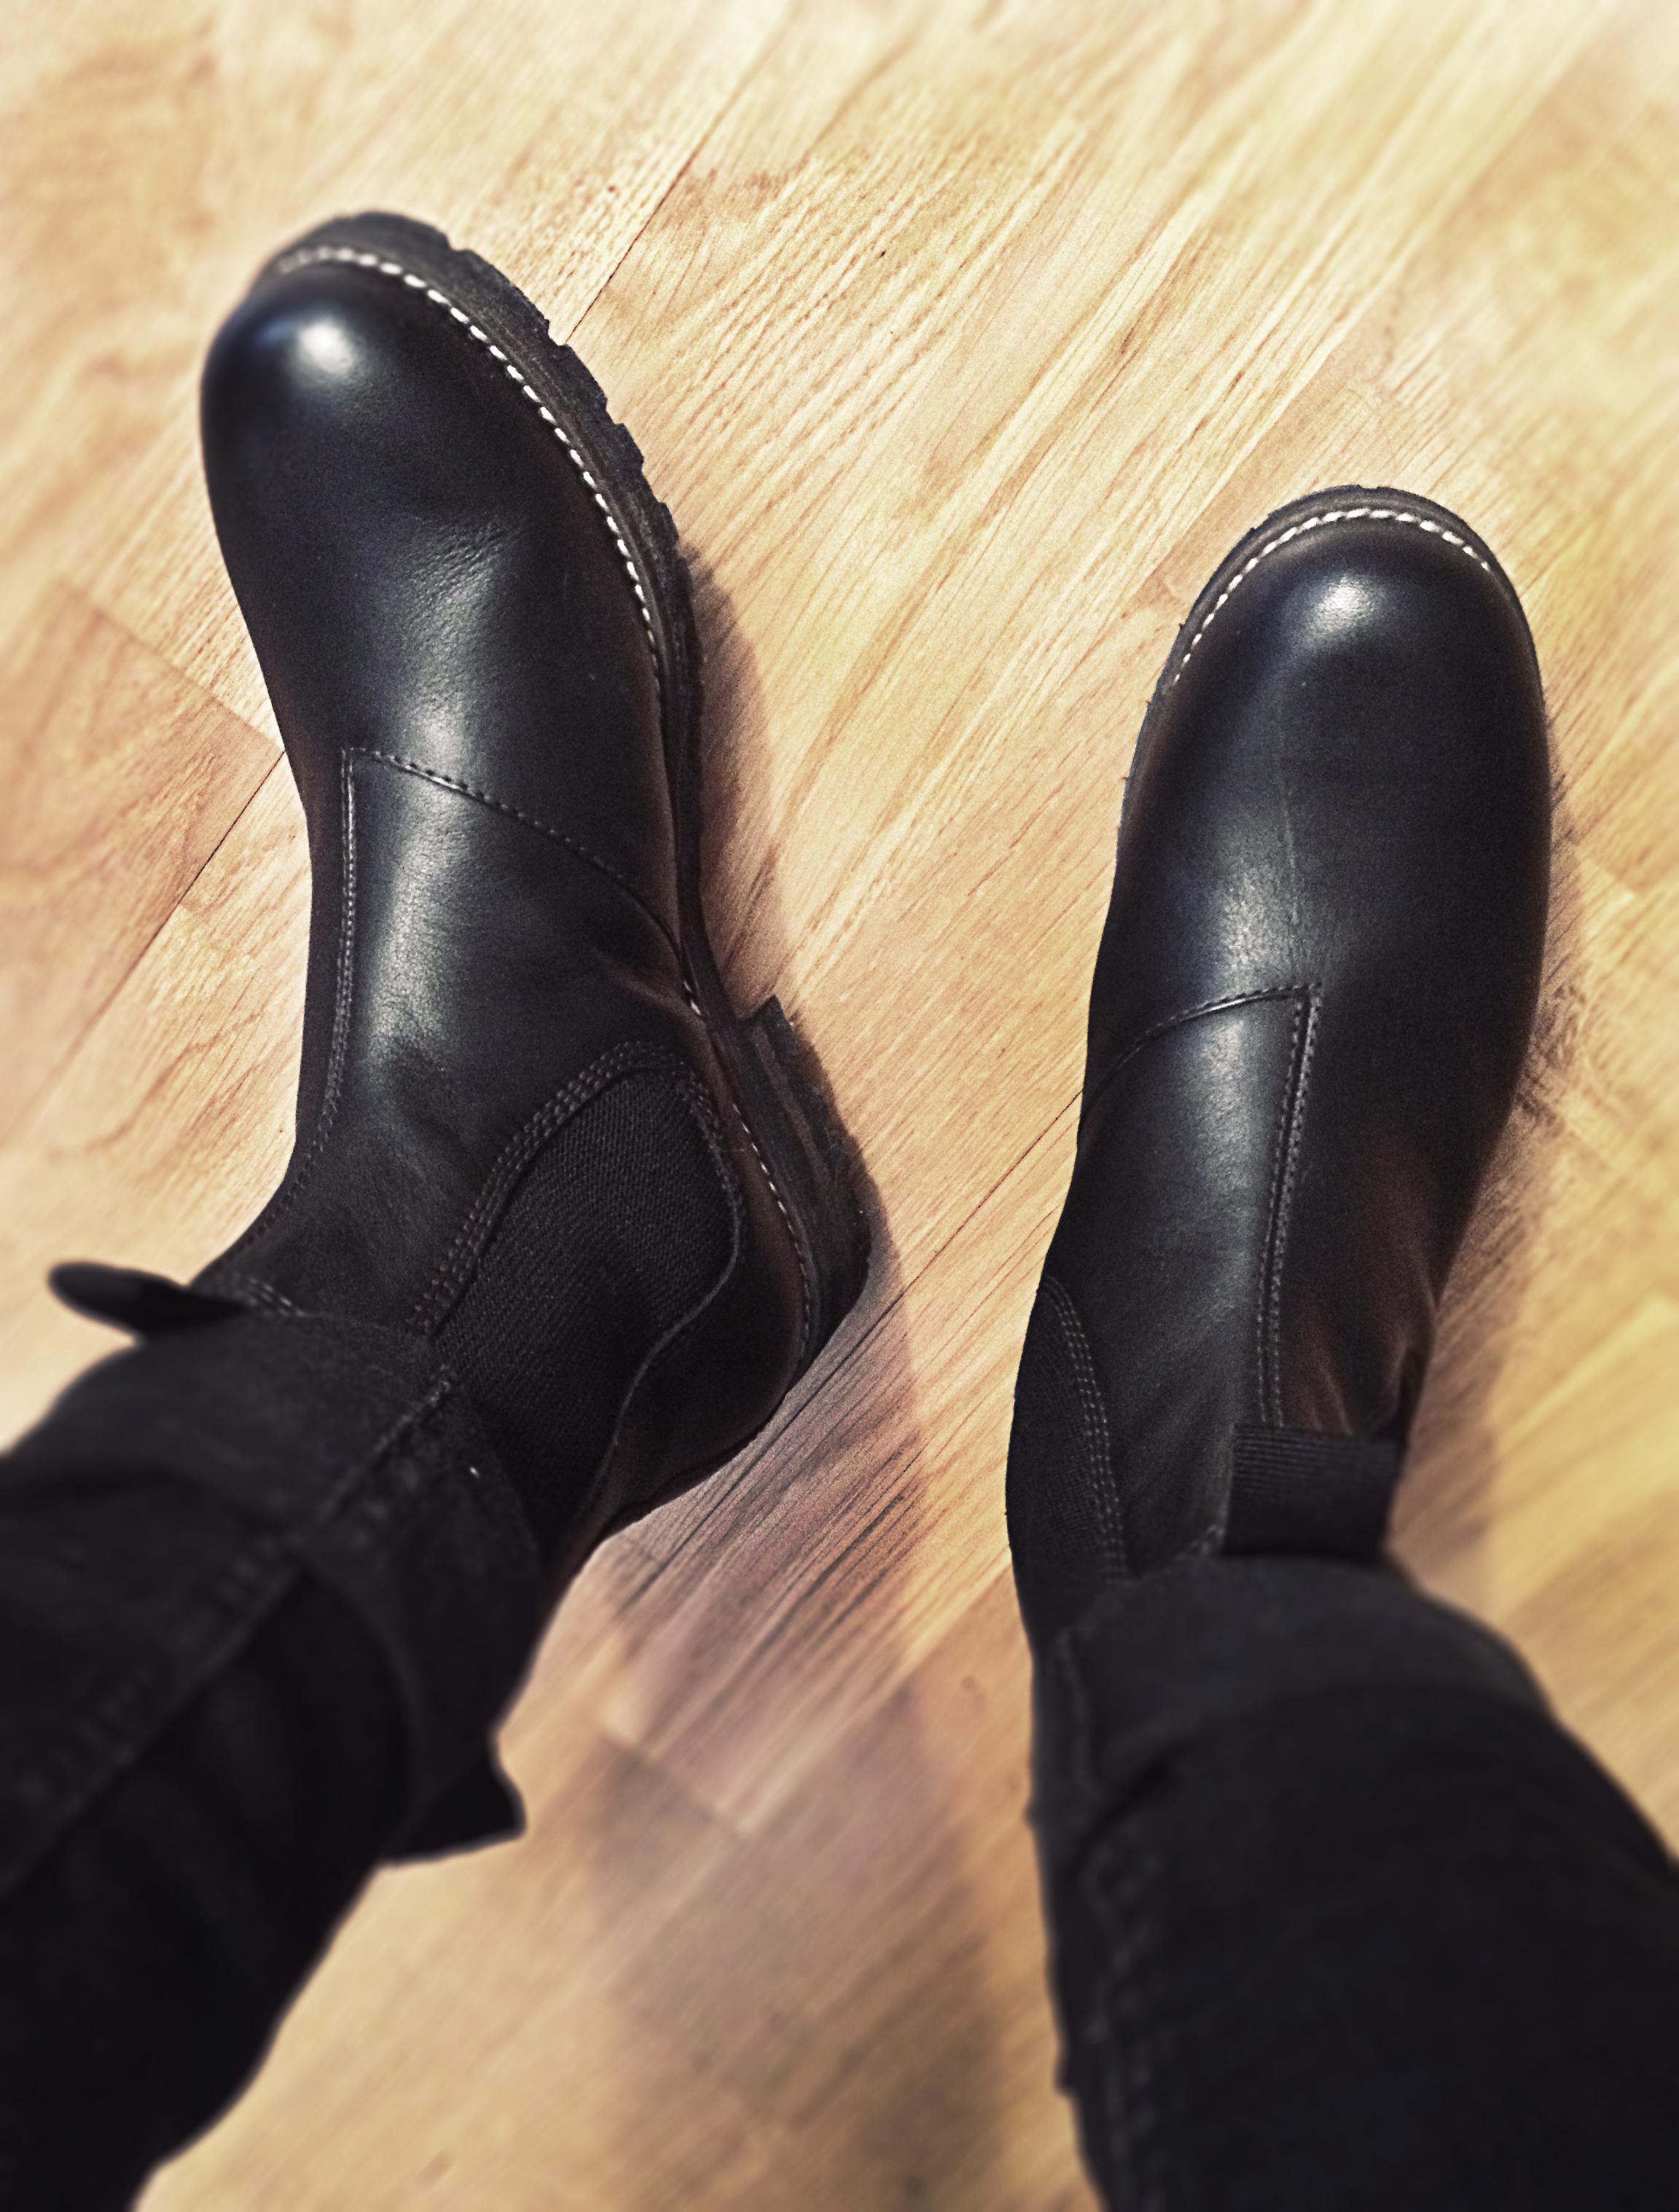 Vagabond boots! <3